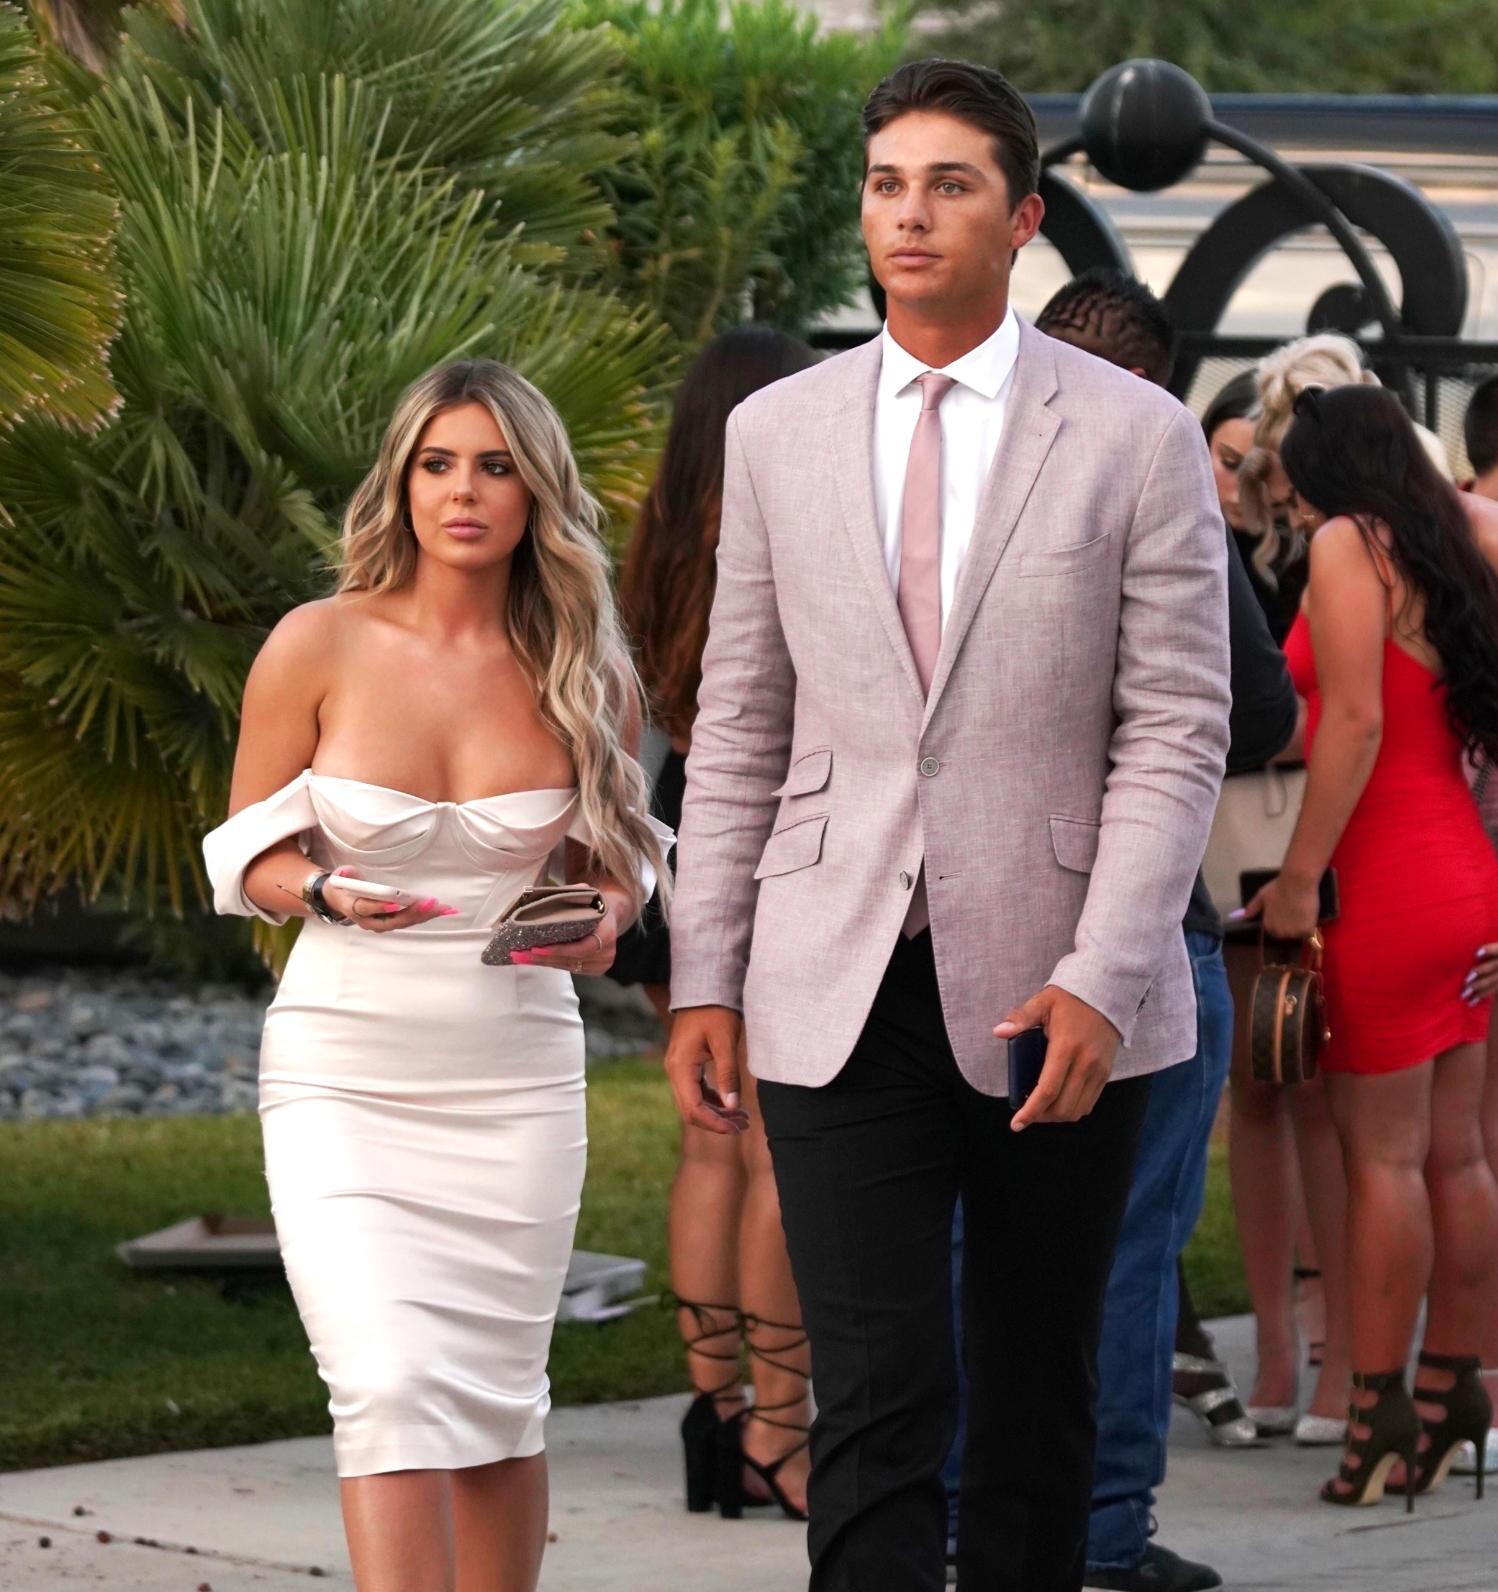 PHOTOS: Don't Be Tardy Star Brielle Biermann Gets Cozy Baseball Player Justin Hooper at Vegas Wedding